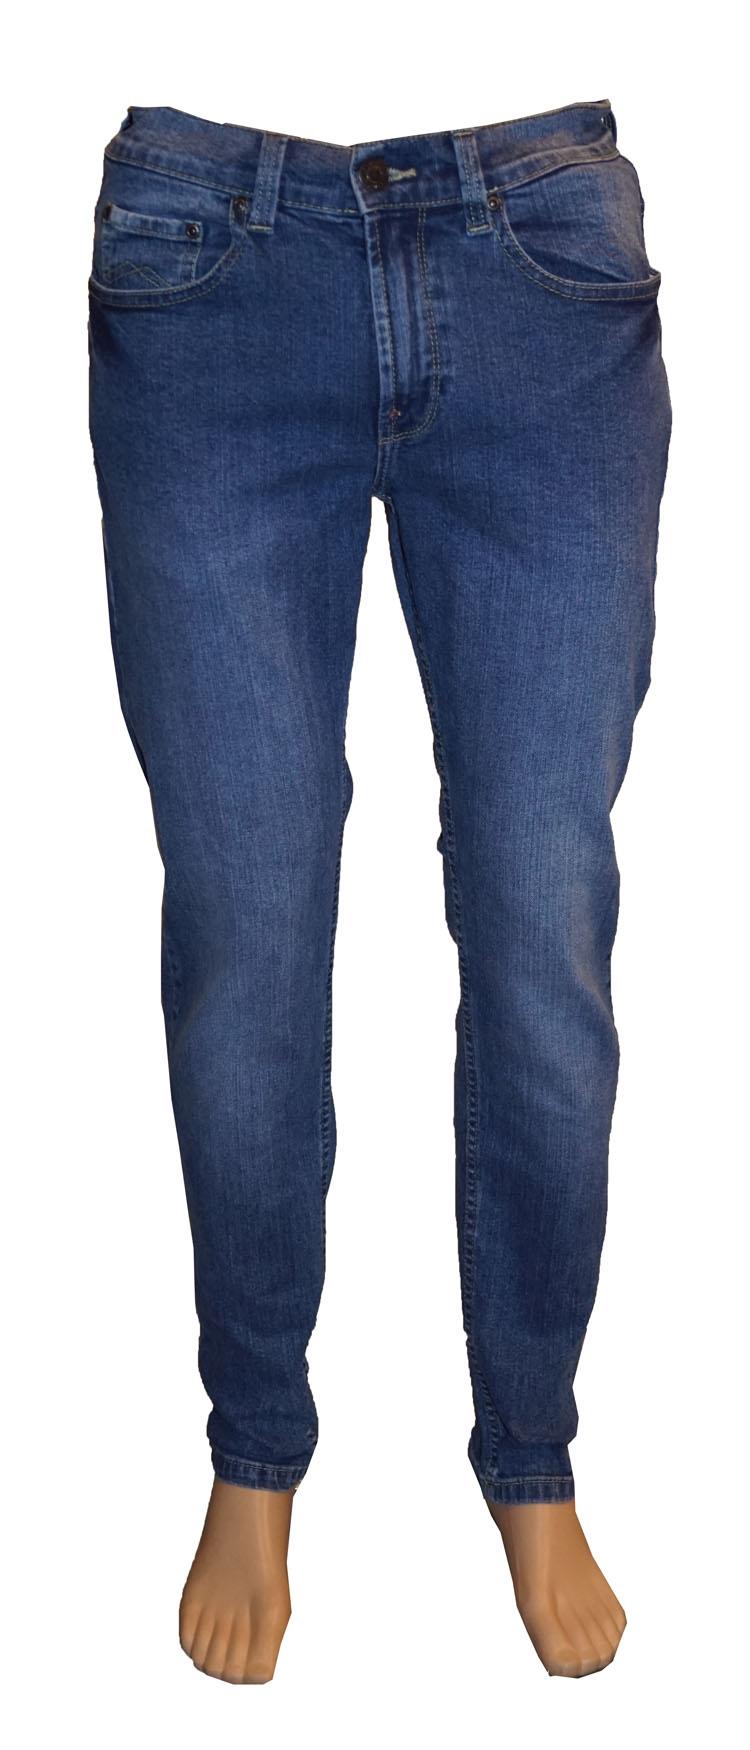 "Maskovick stretch jeans  "" Milano slim fit "" Medium used"